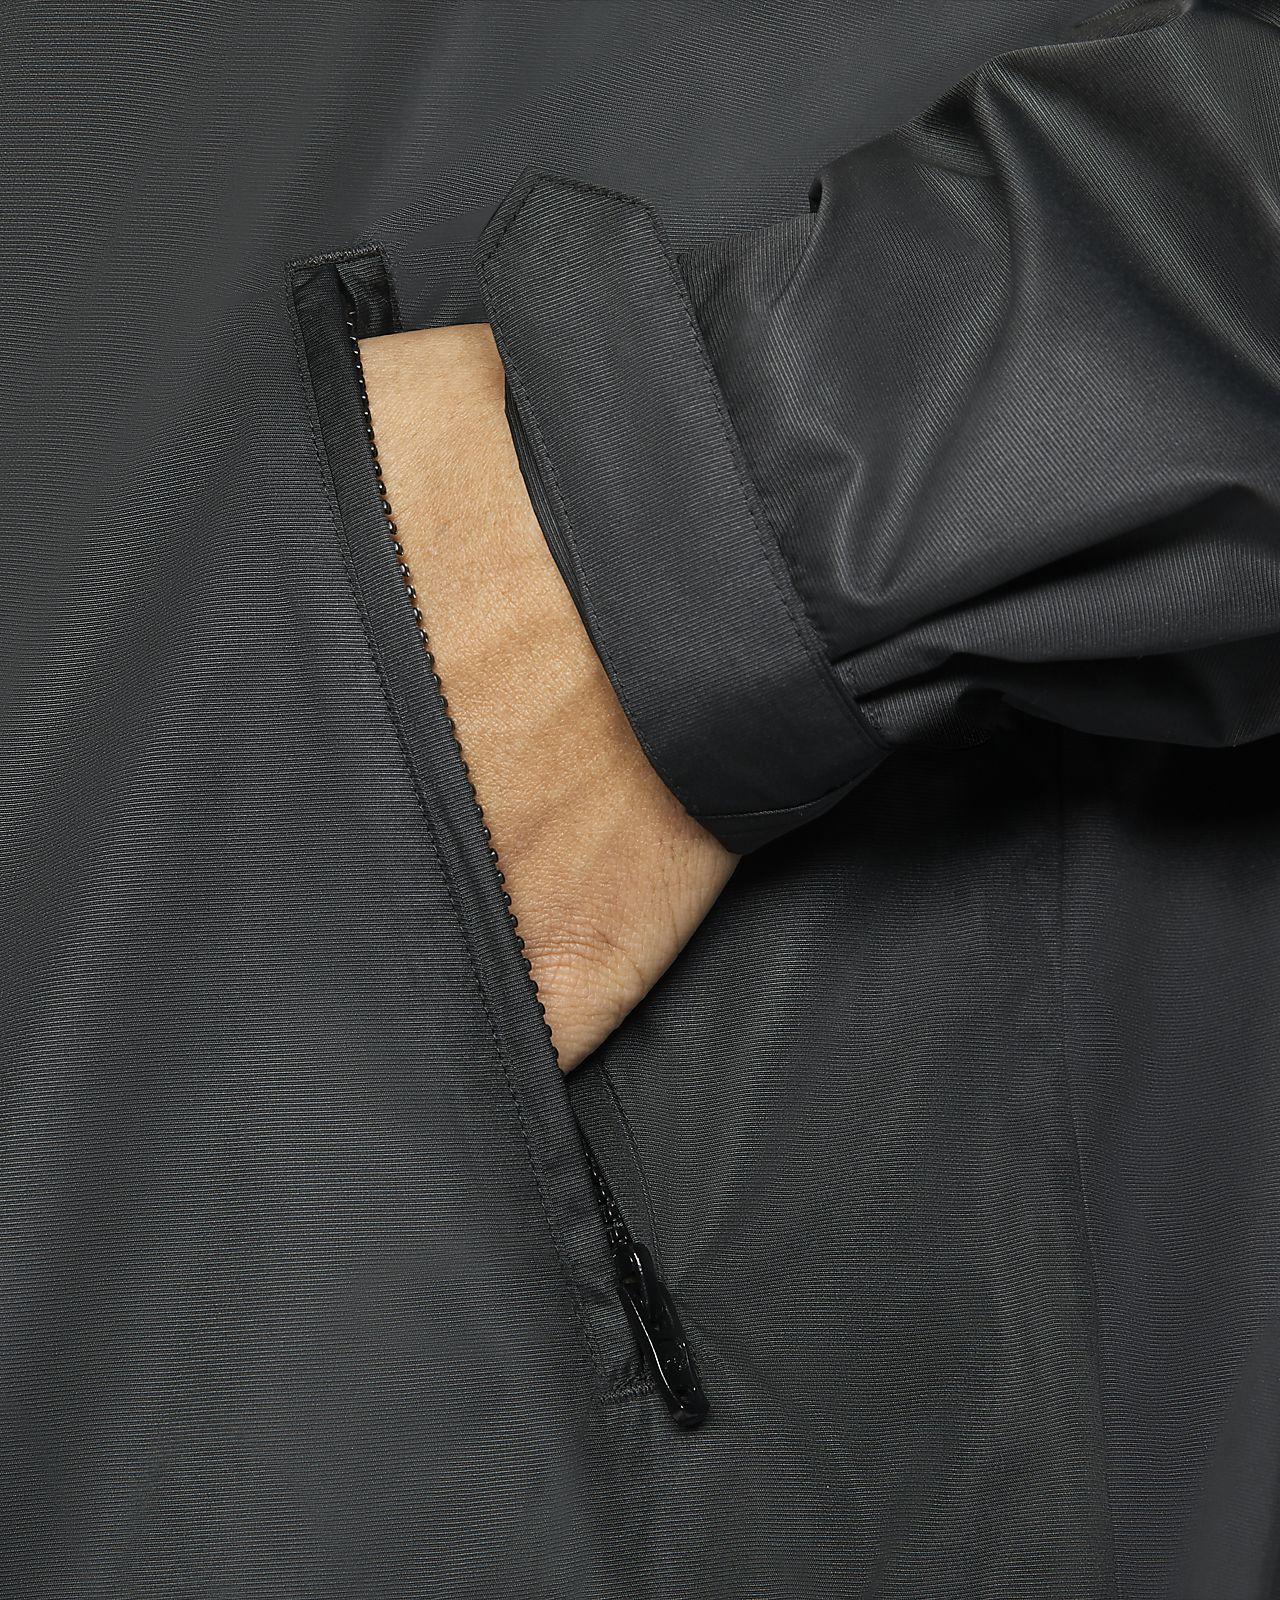 Nike Sb Veste Anorak Skateboard CI7185 010 Noir Modèle